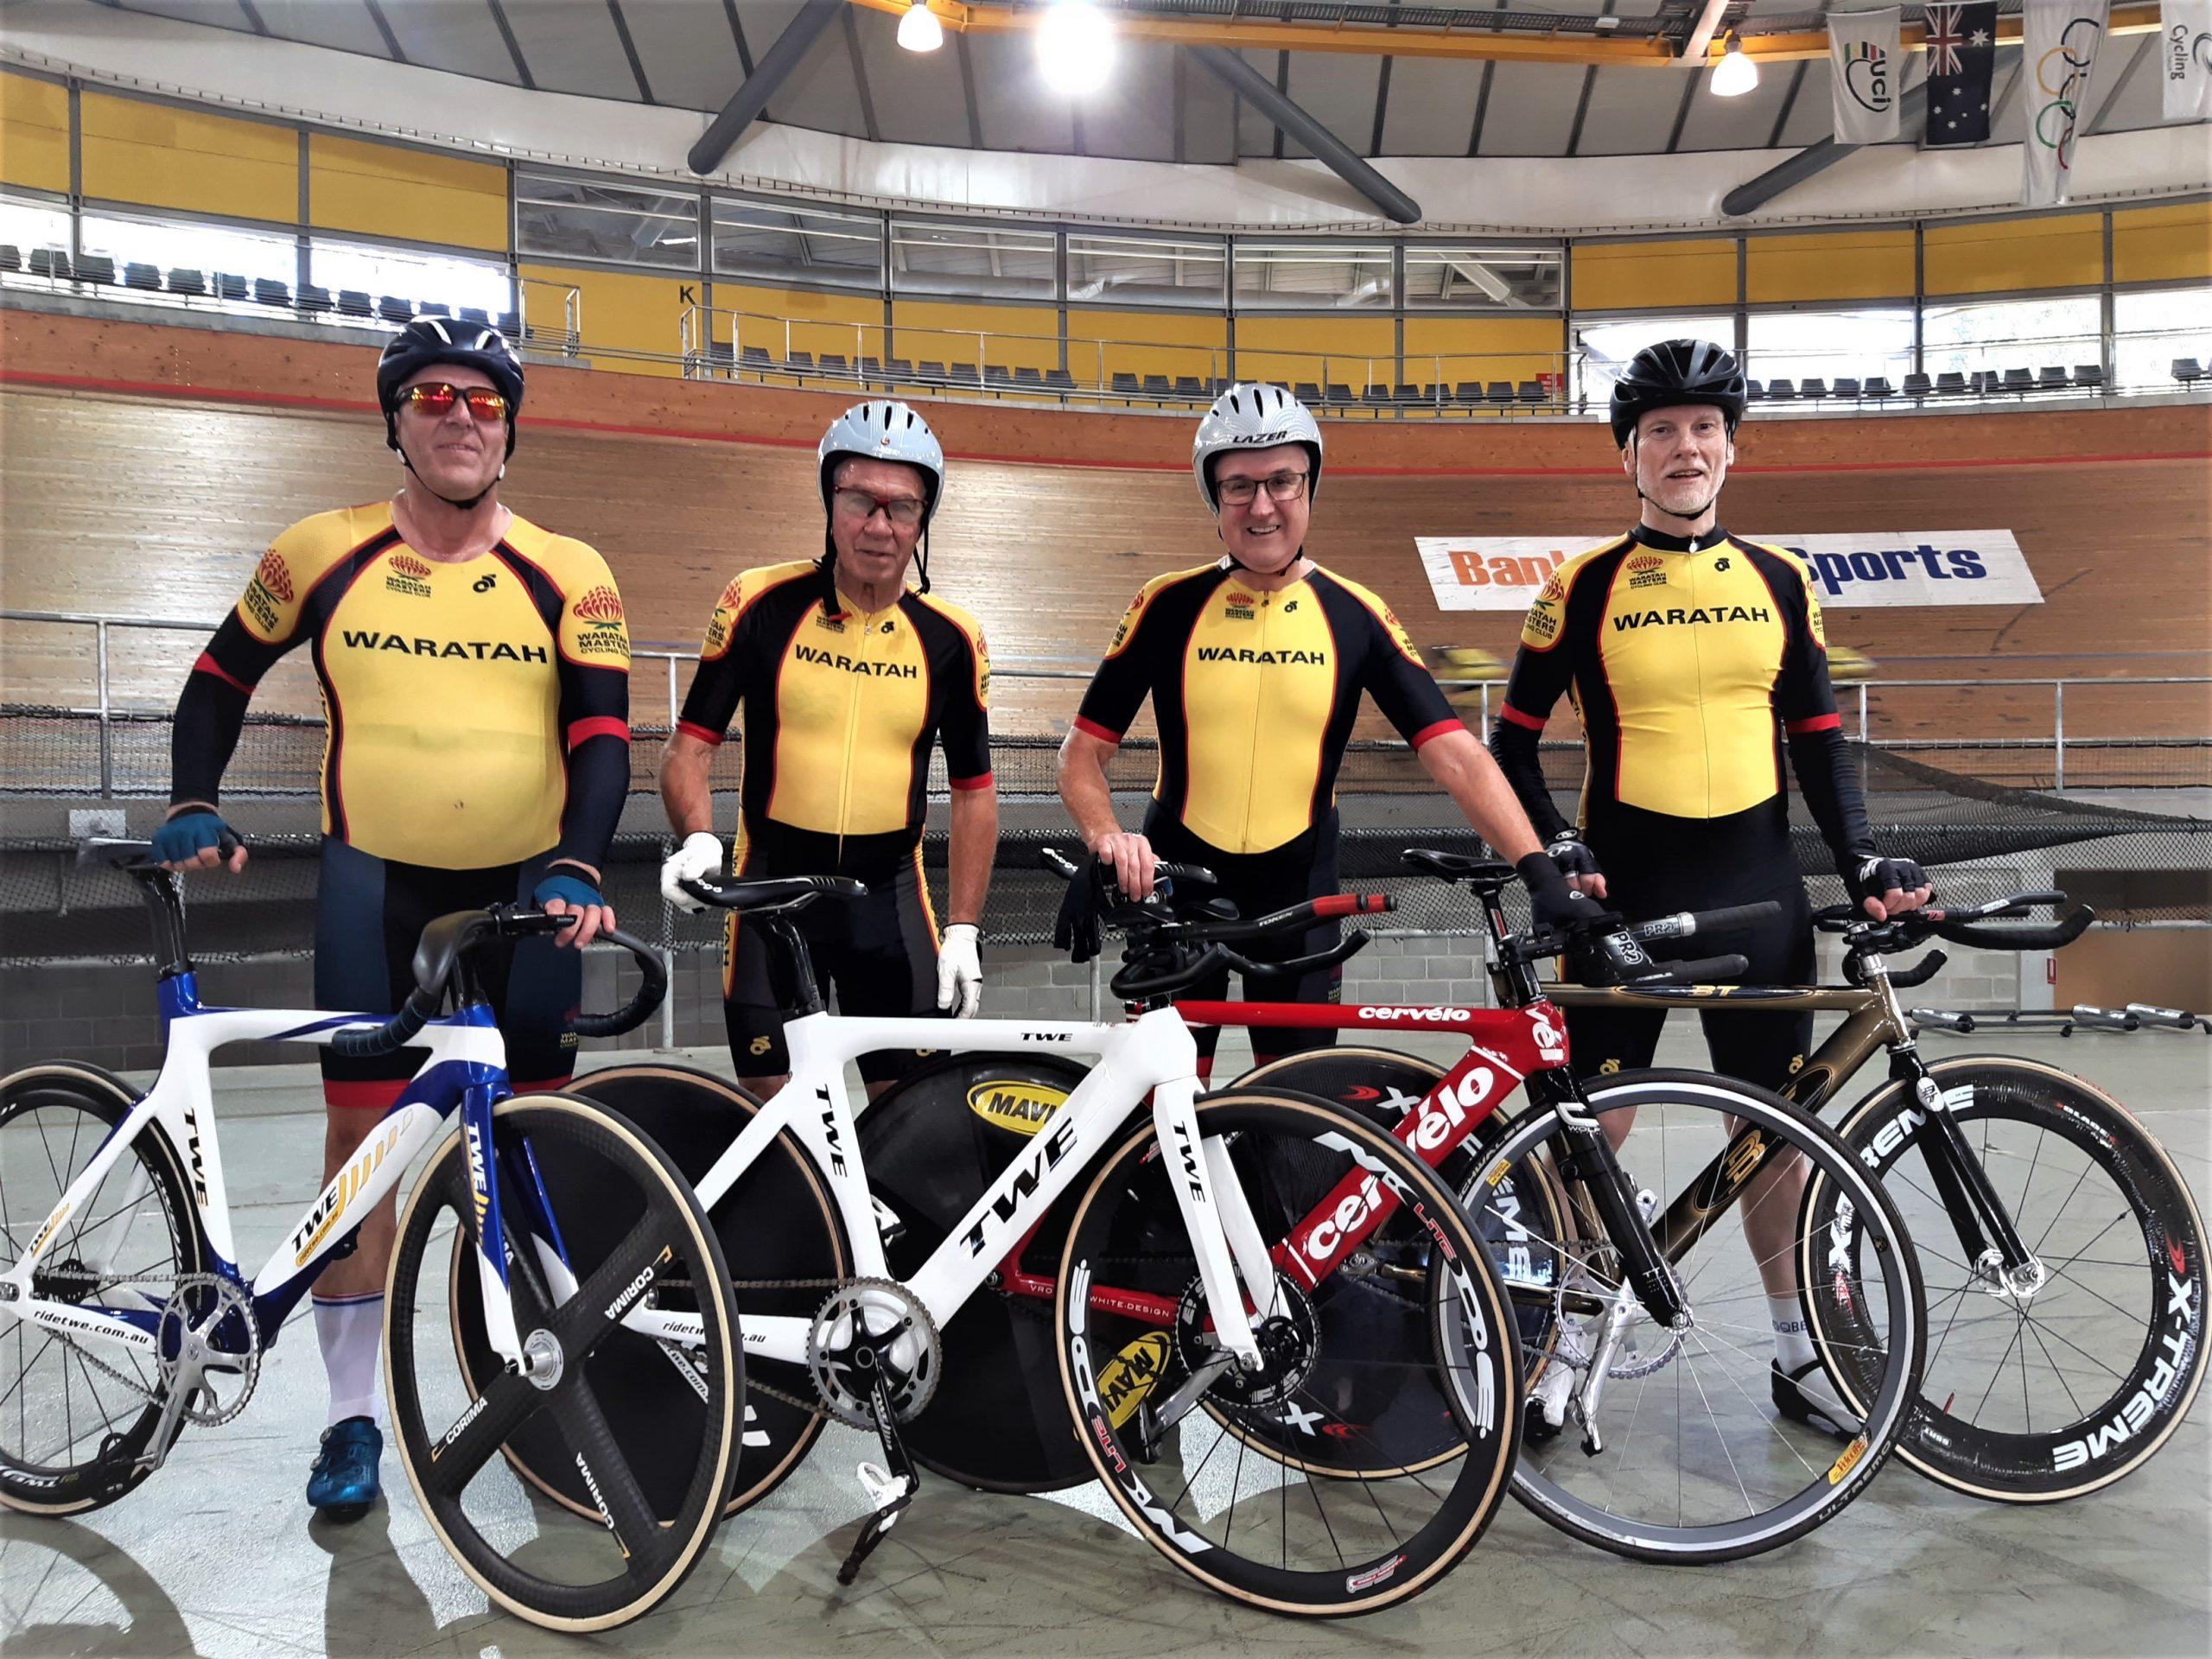 Waratahs Team Persuit Team 2021